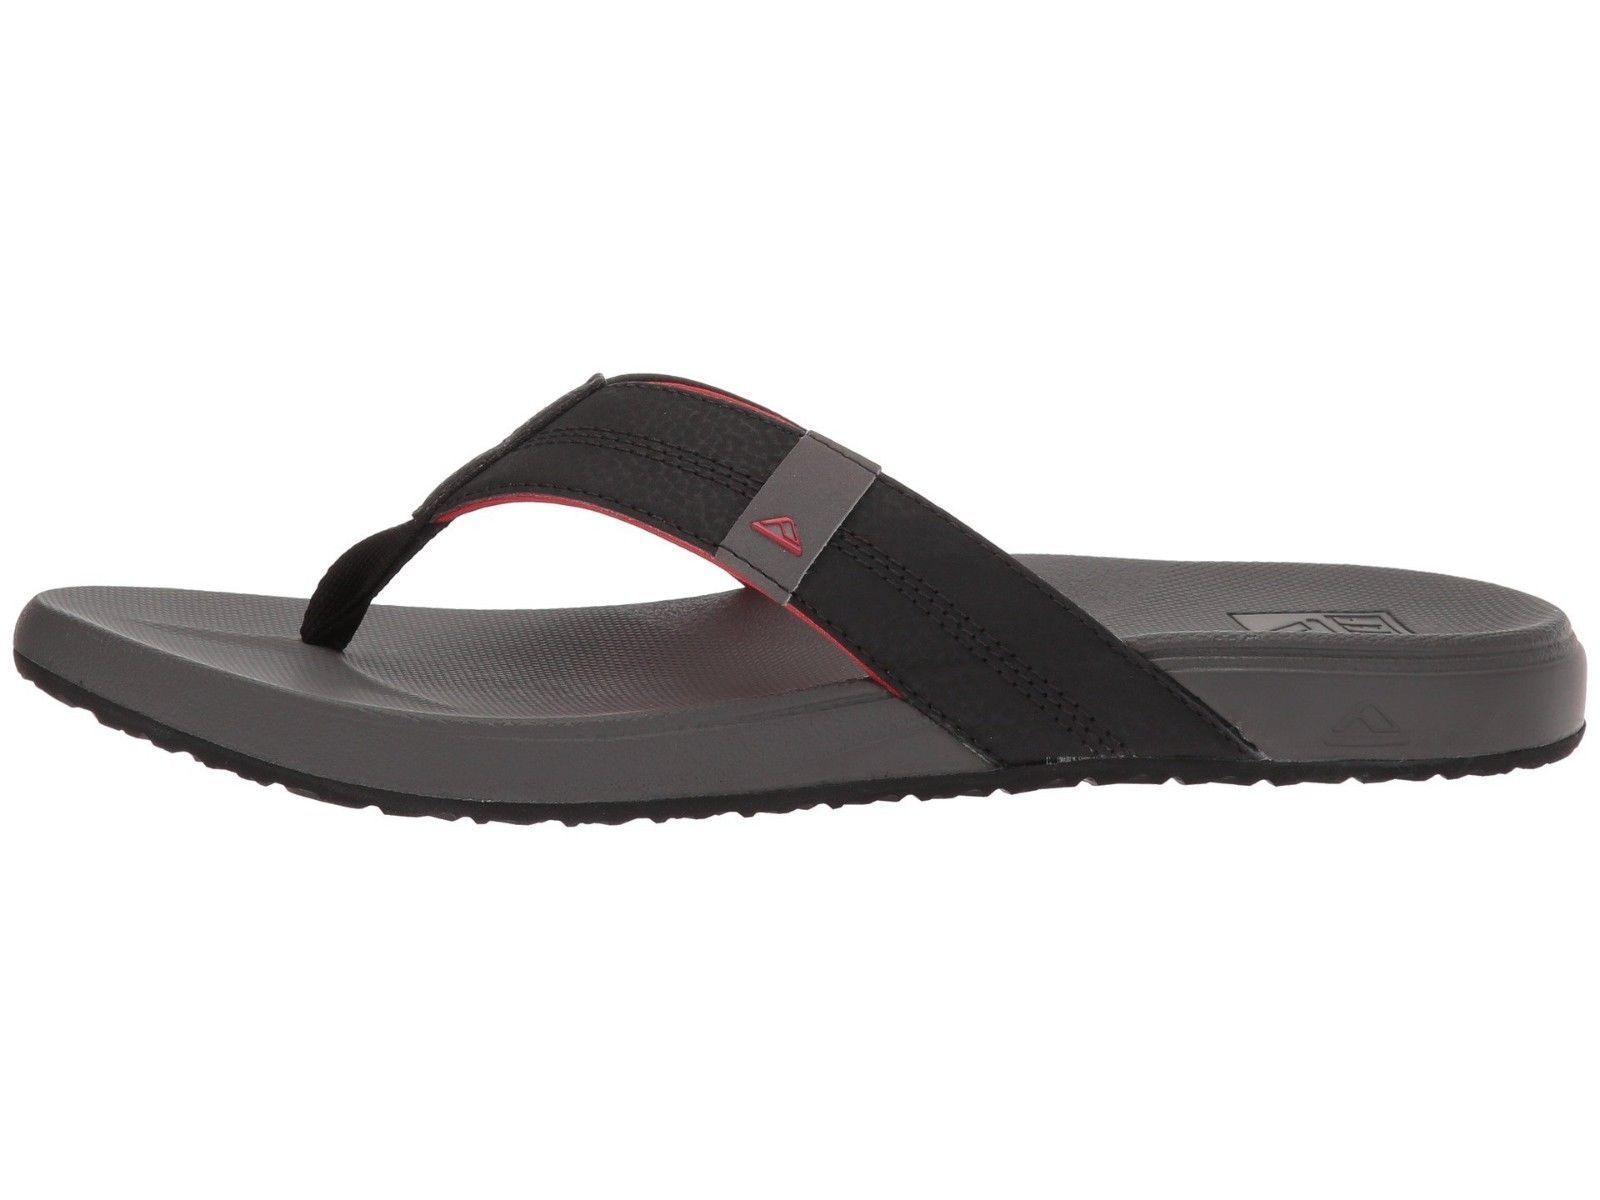 Reef / Cushion Bounce Phantom Grey / Reef Red Men's Sandals RF0A3FD1 dbb920